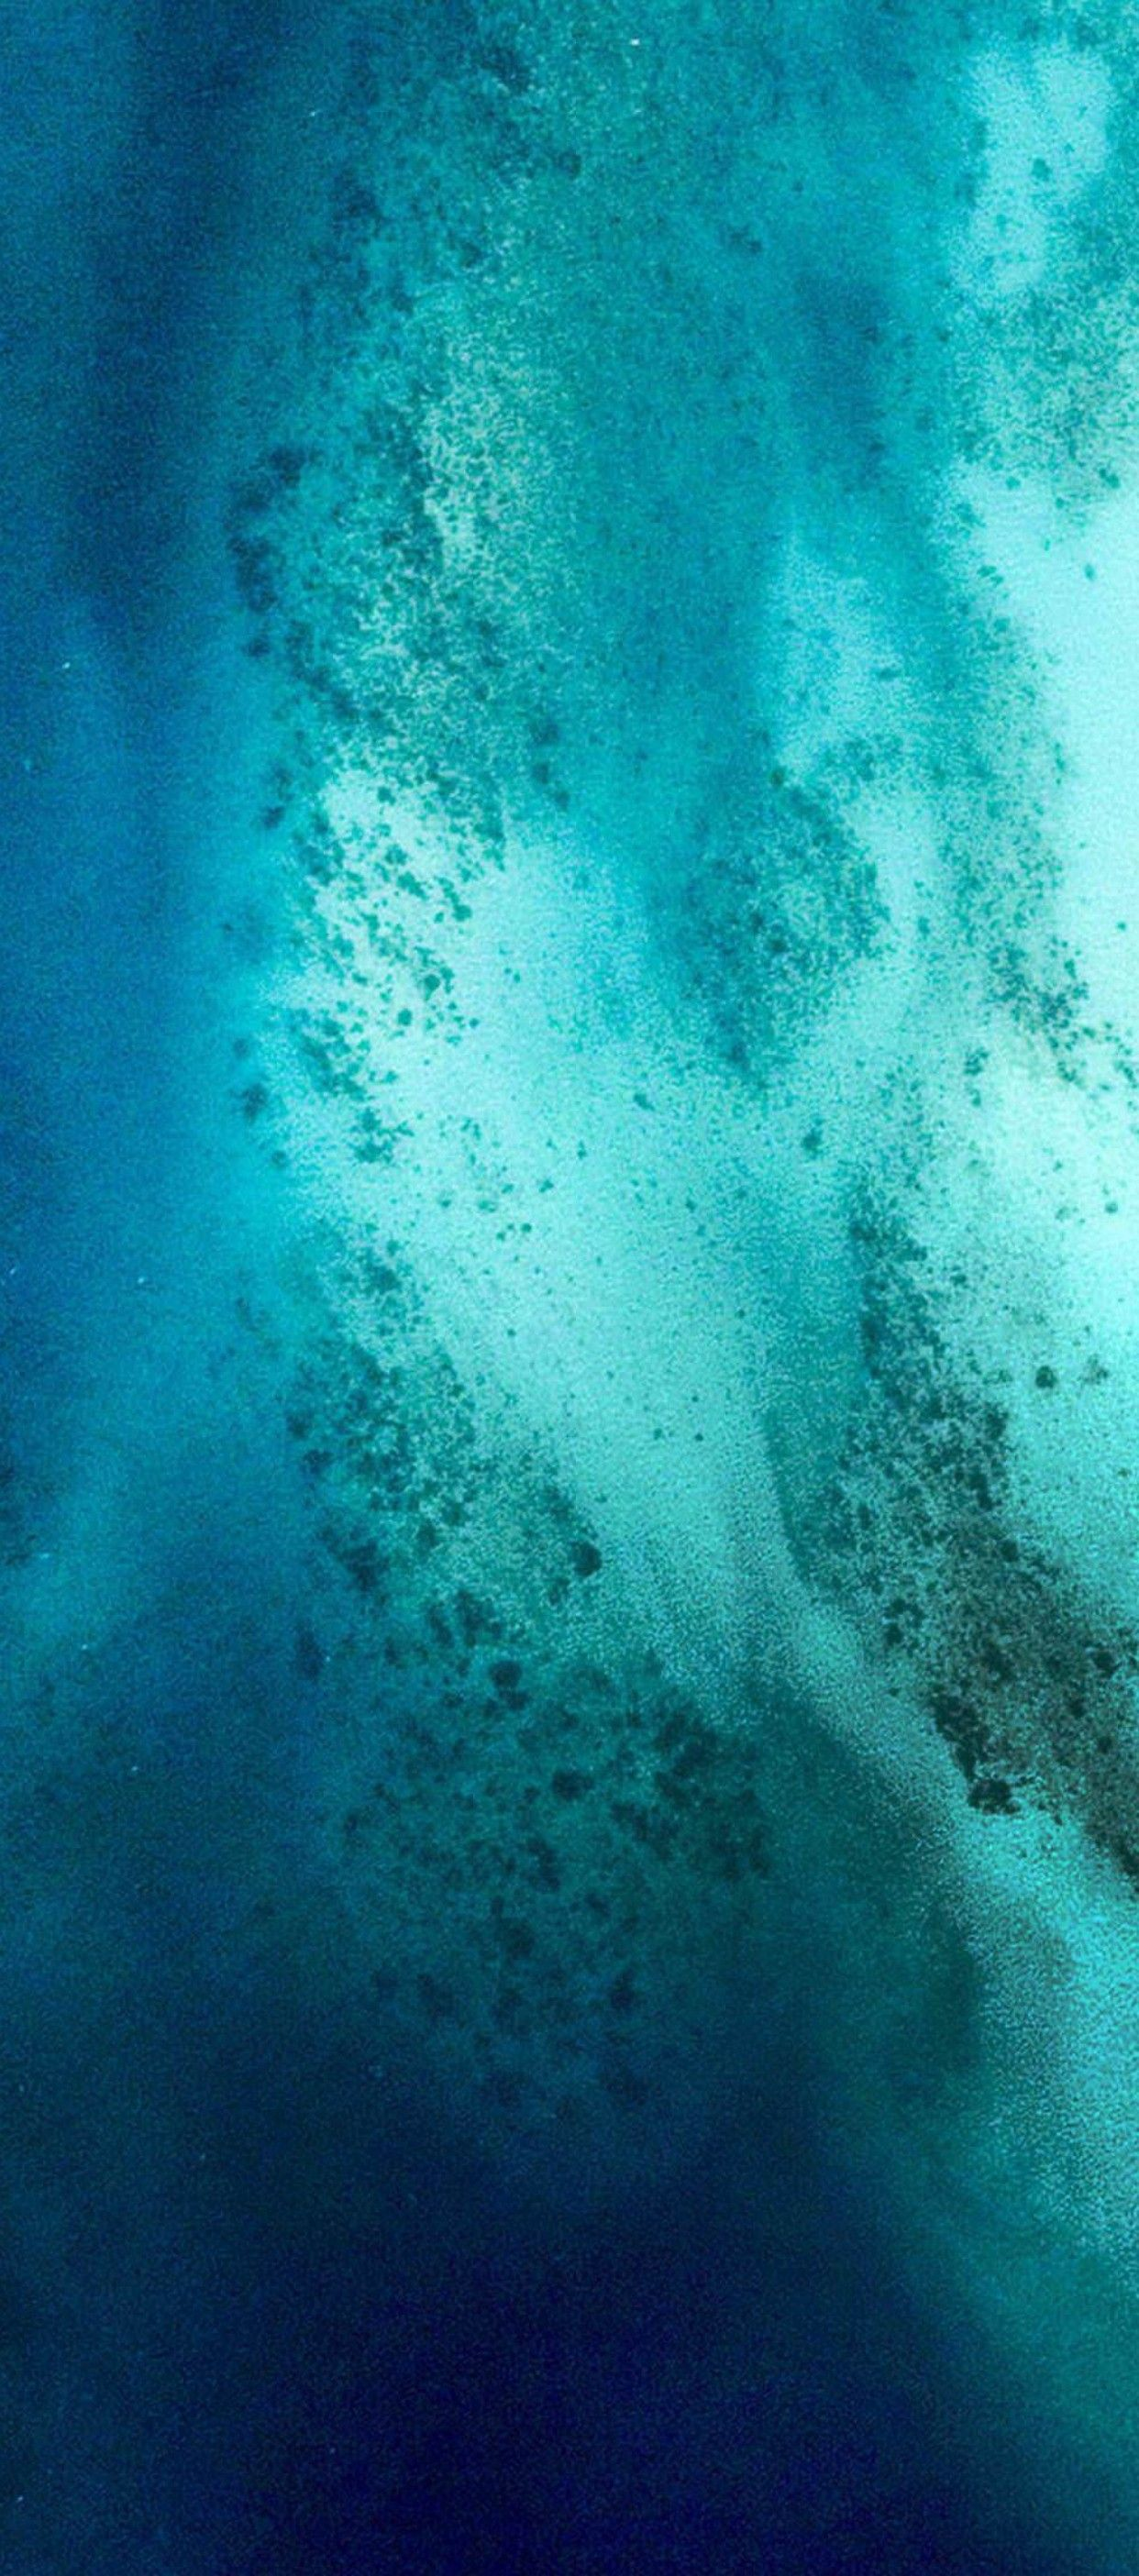 Ios 11 Iphone X Aqua Blue Water Wave Ocean Apple Wallpaper Iphone 8 Clean B Iphone Wallpaper Ocean Blue Wallpaper Iphone Iphone Background Wallpaper